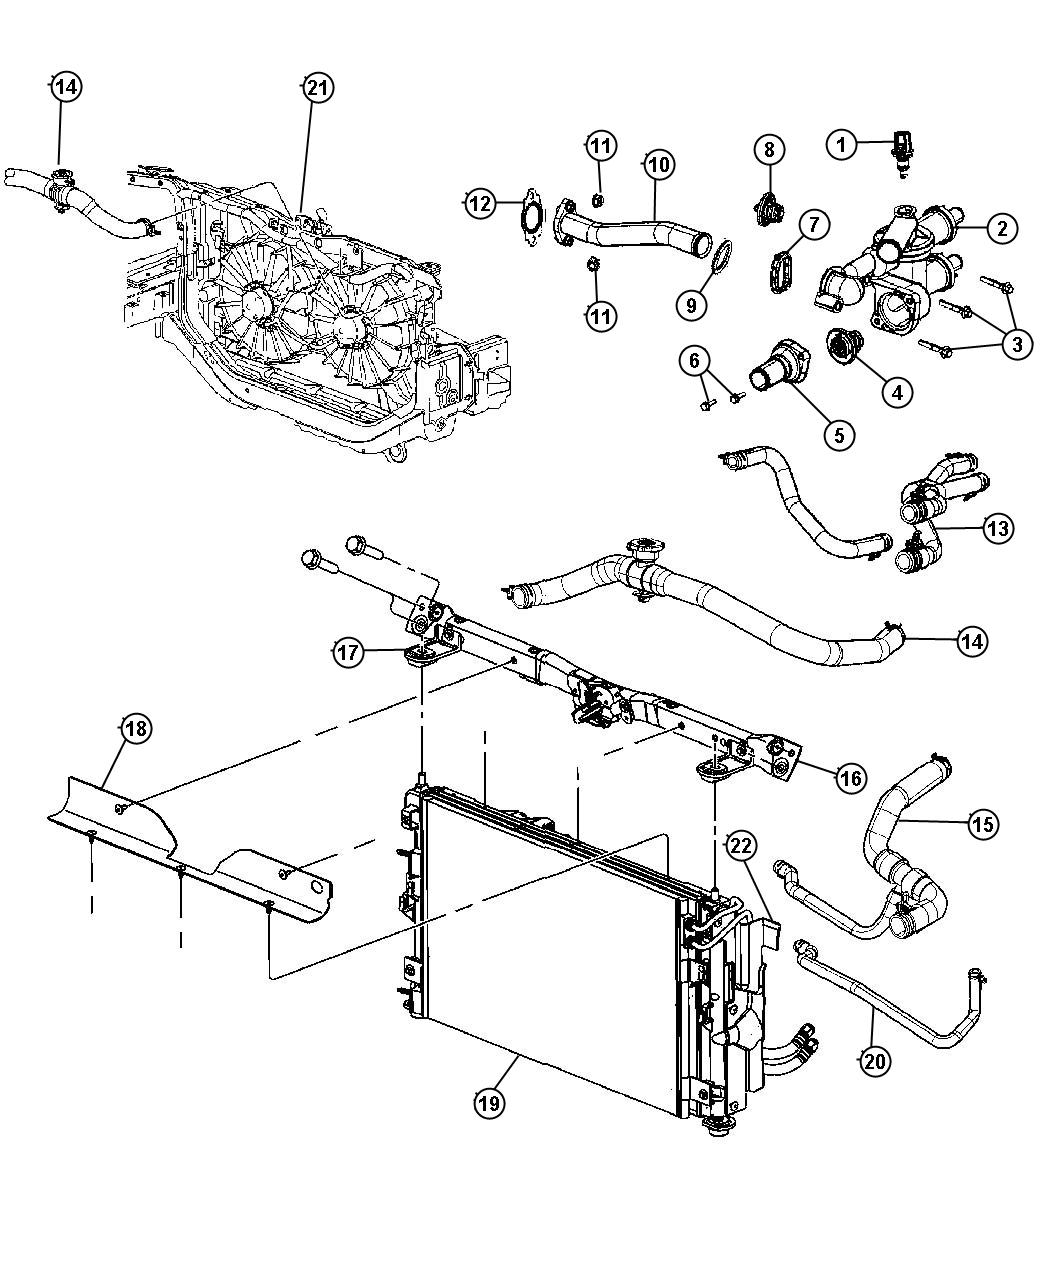 Chrysler Sebring Hose Used For Heater Supply And